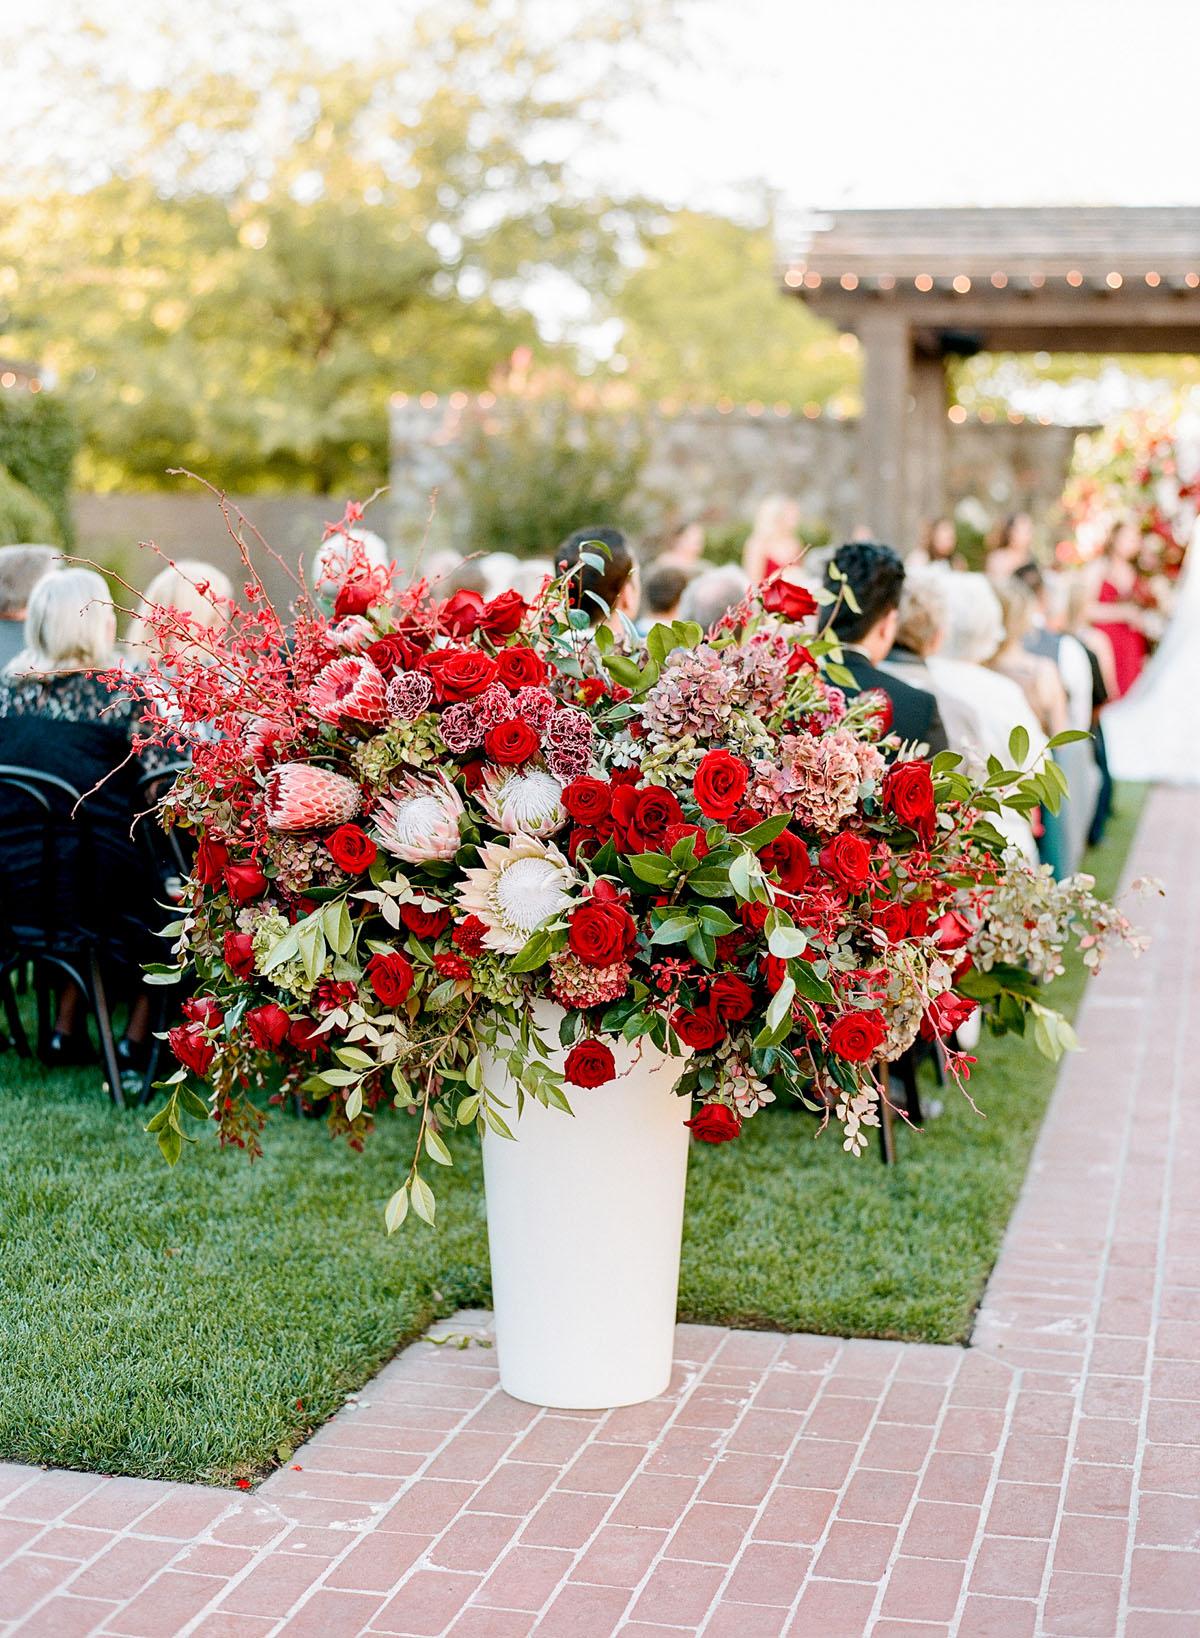 26-red-floral-design-decor-wedding.jpg